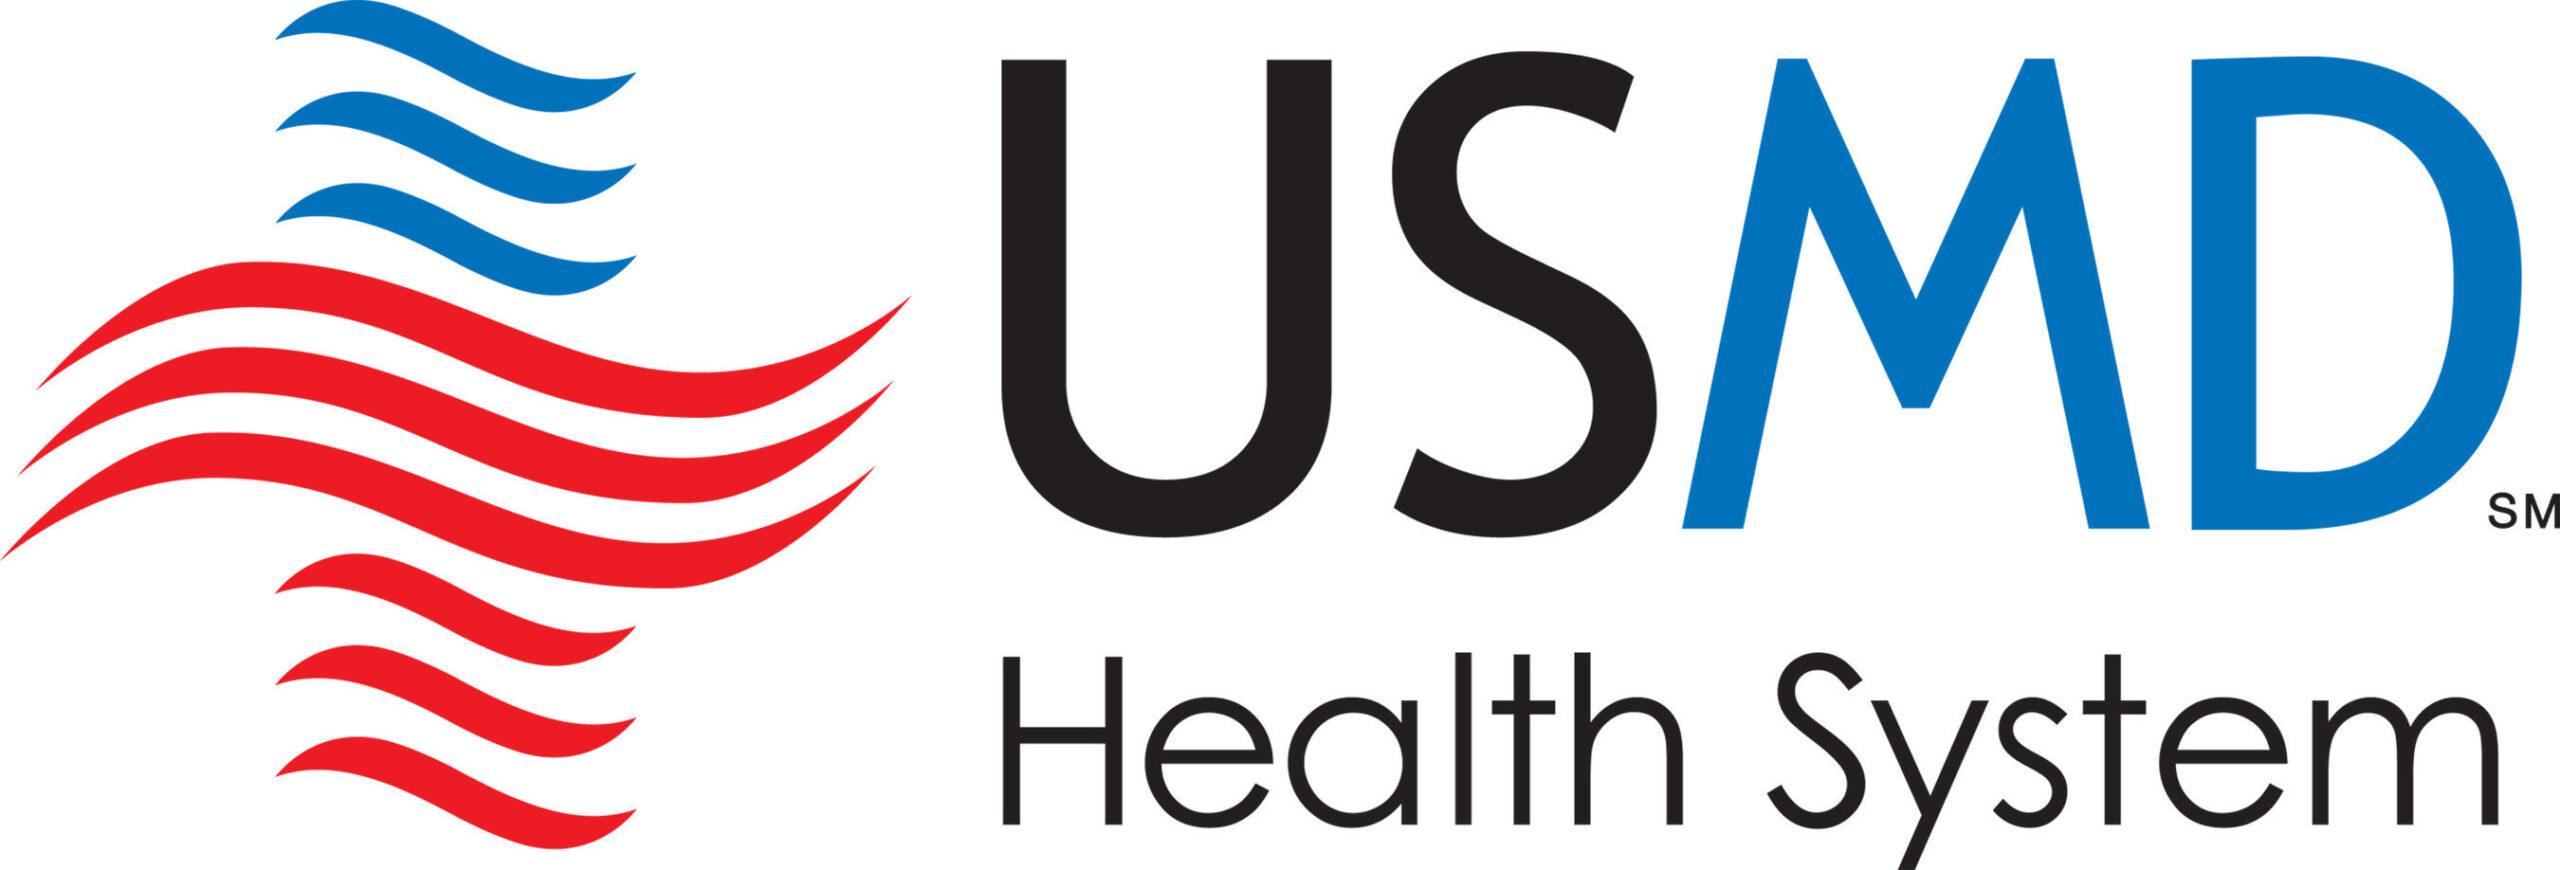 USMD Holdings, Inc. (PRNewsFoto/USMD Holdings, Inc.)